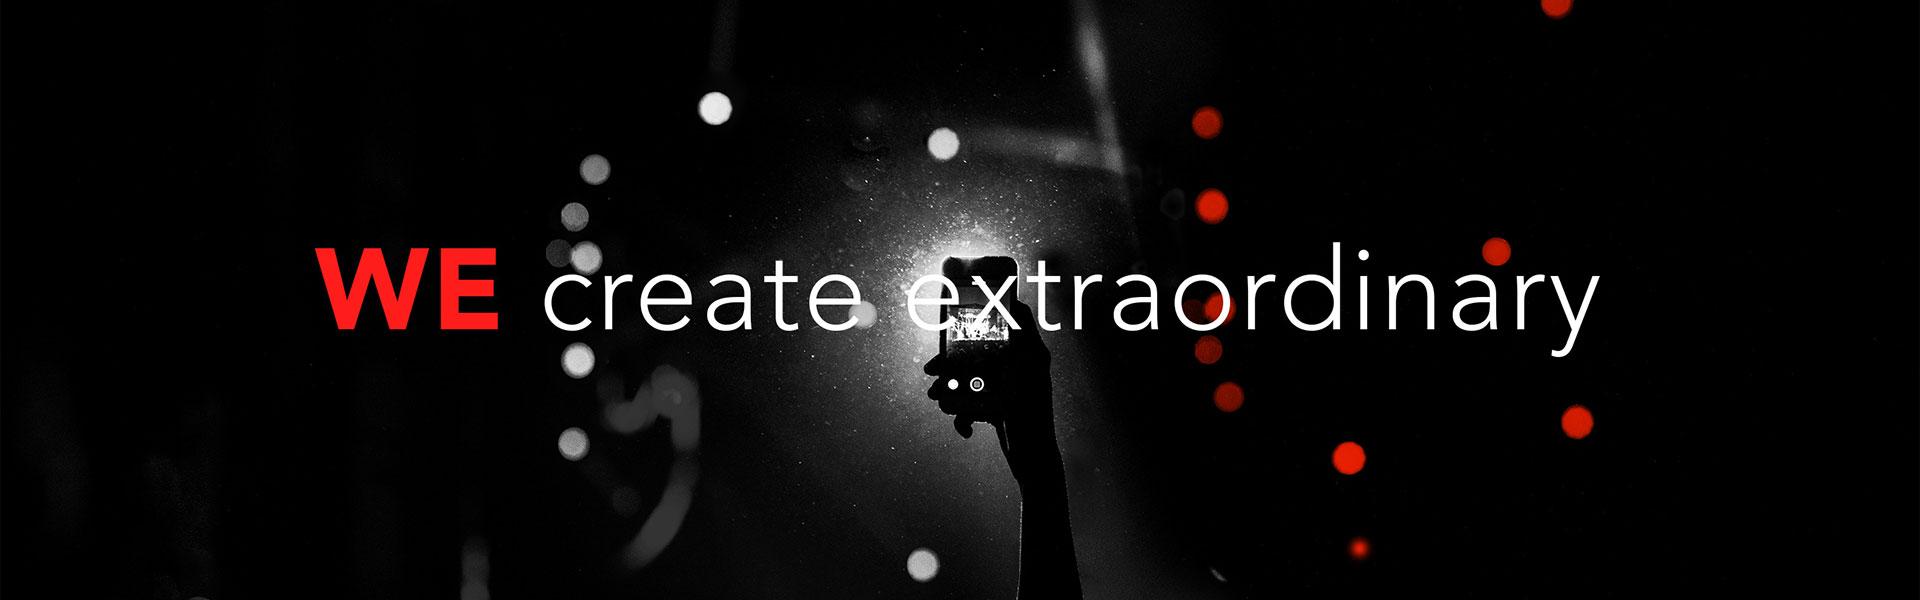 WE create extraordinary